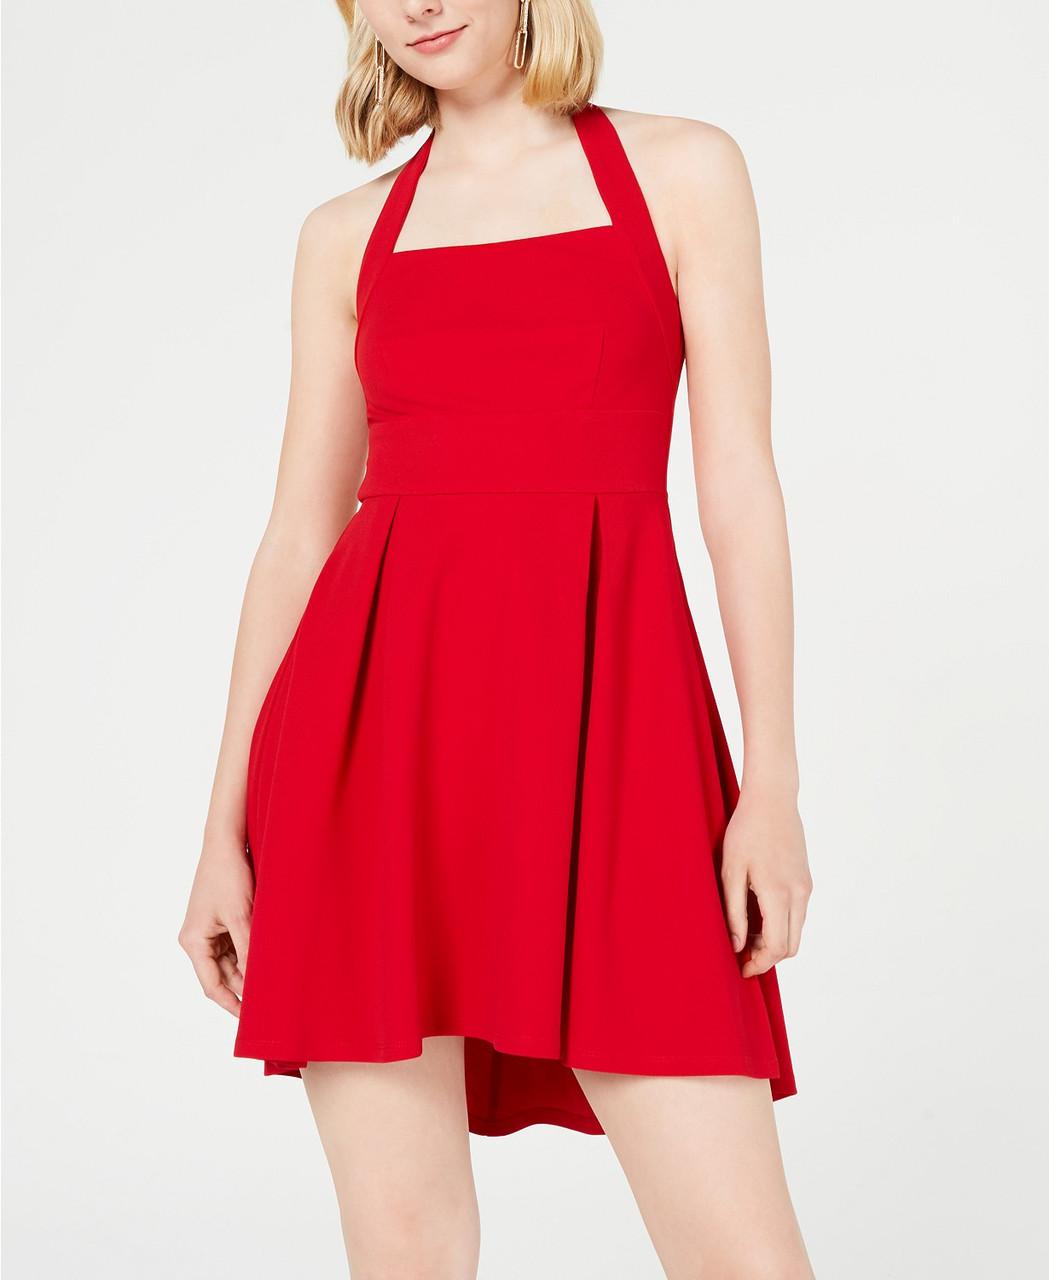 Teeze Me Женское платье -Т1